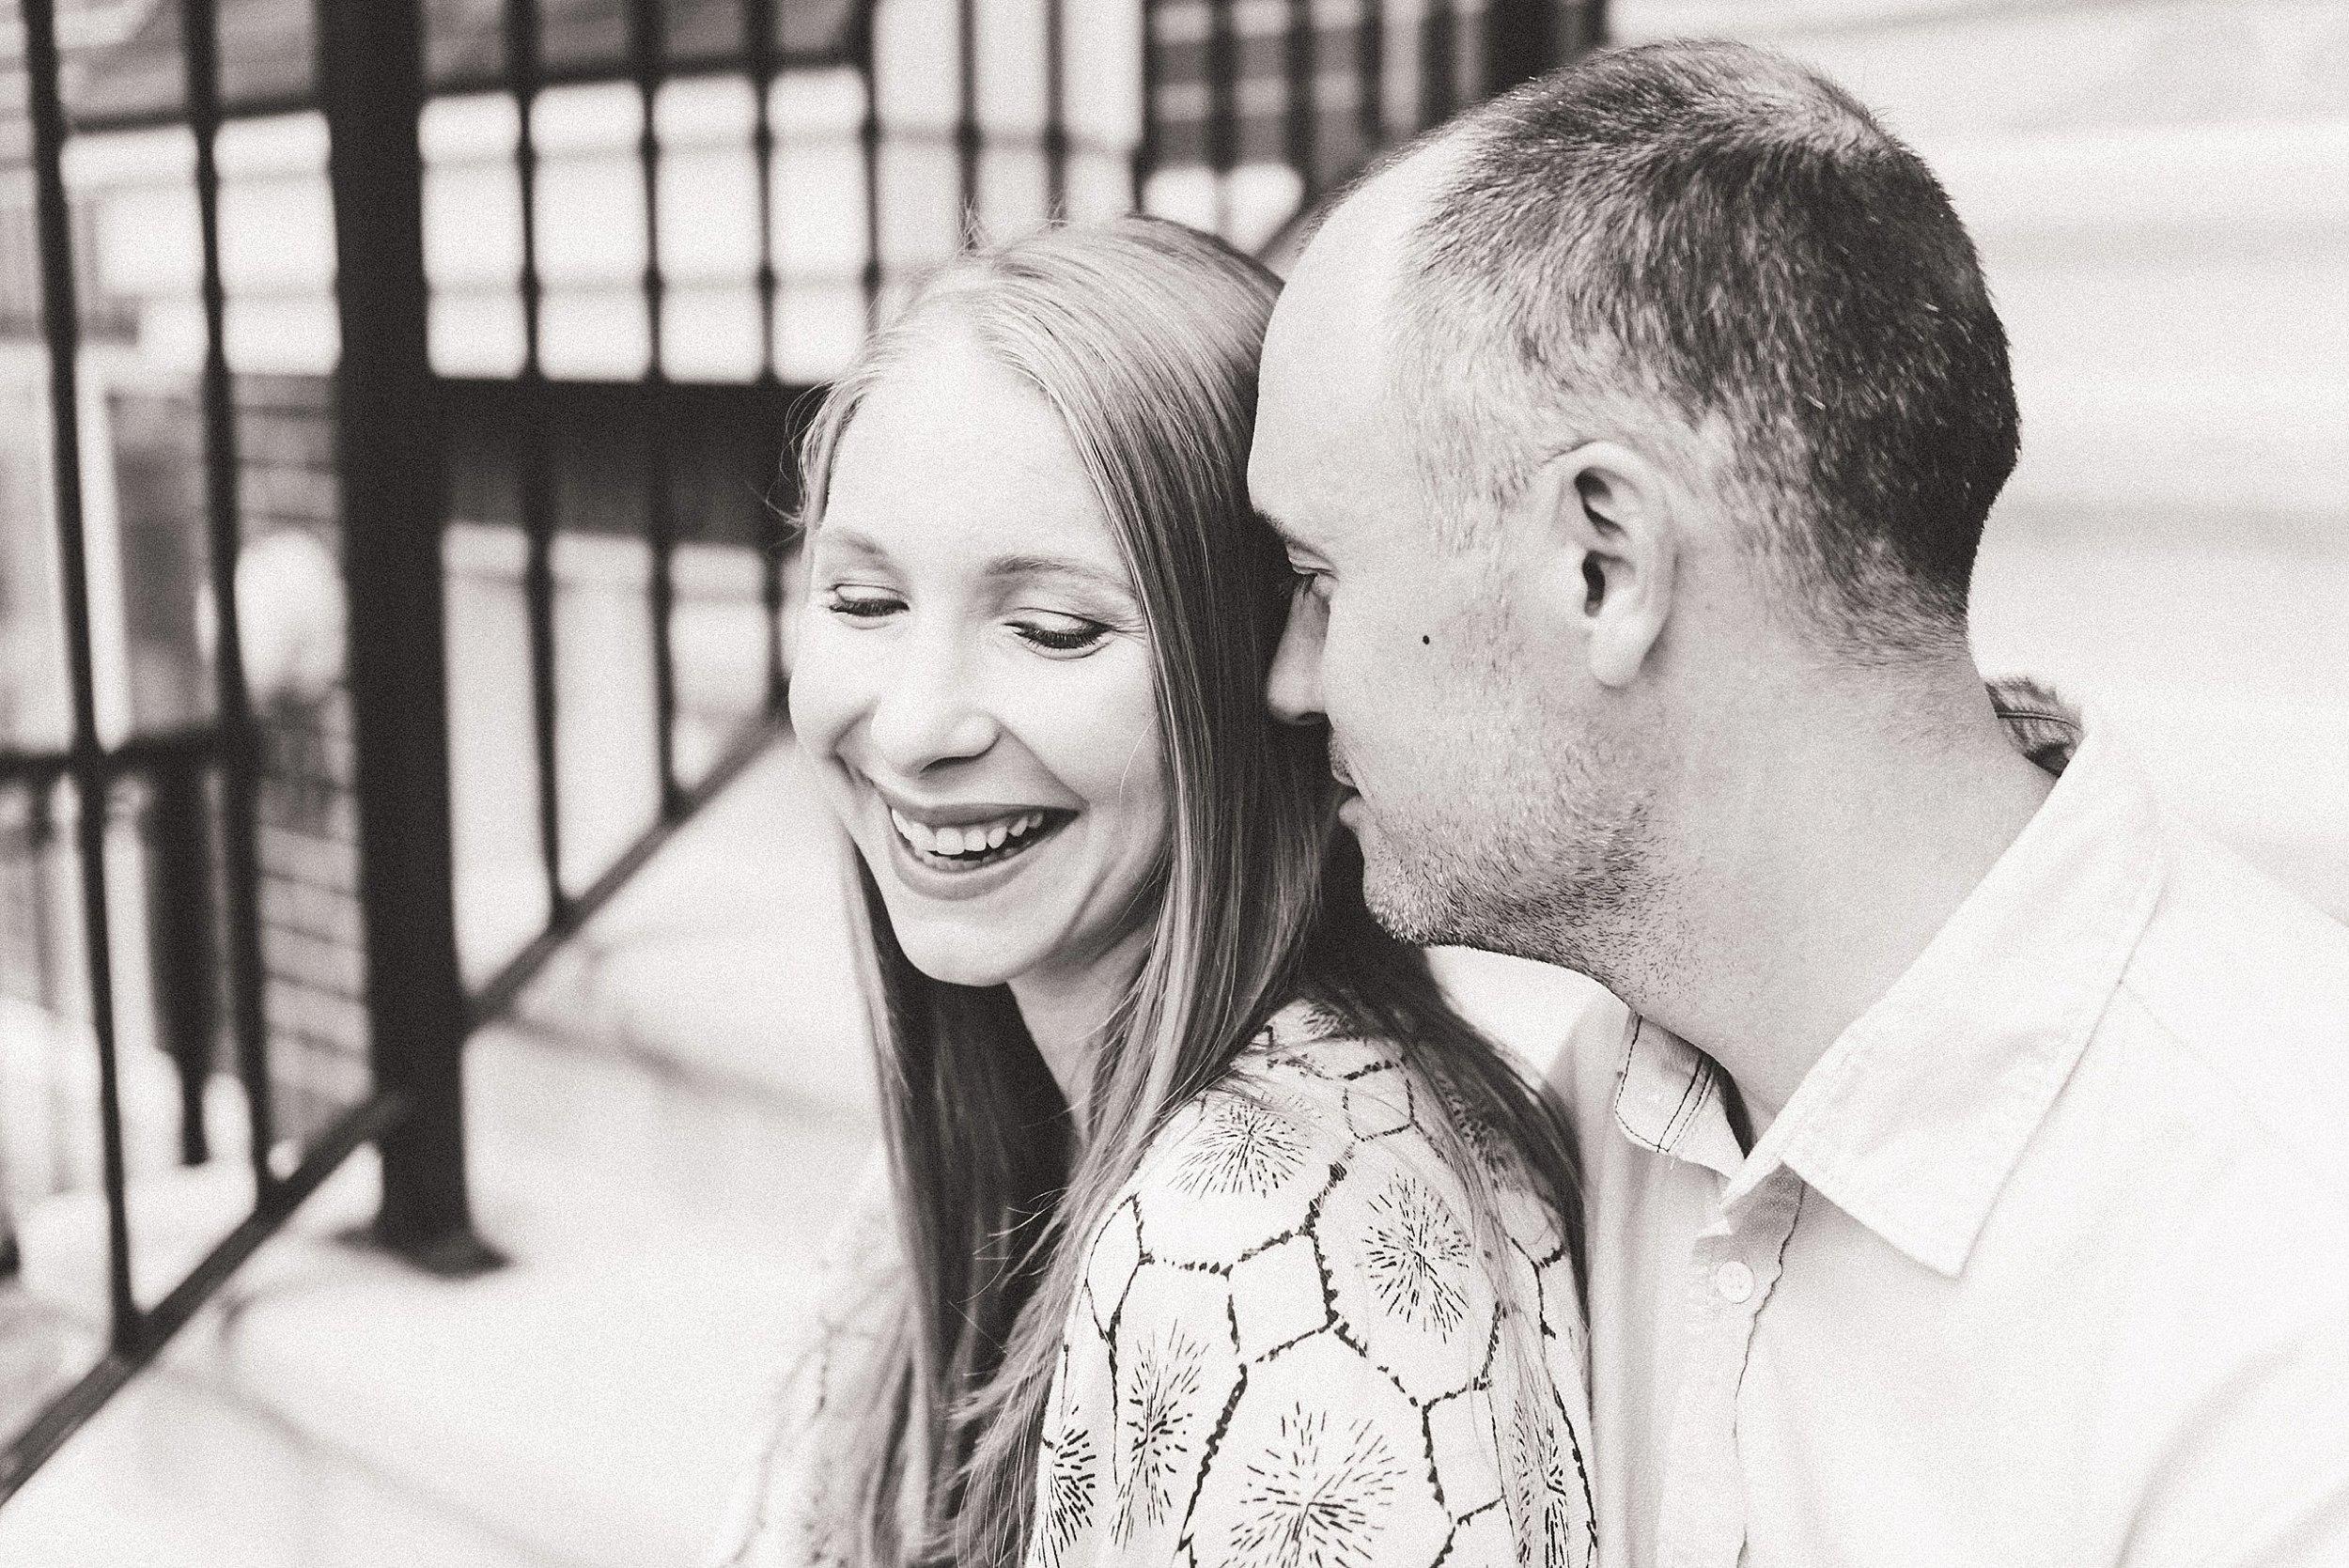 Liz + Ryan Engagement | Ali & Batoul Photography-5.jpg